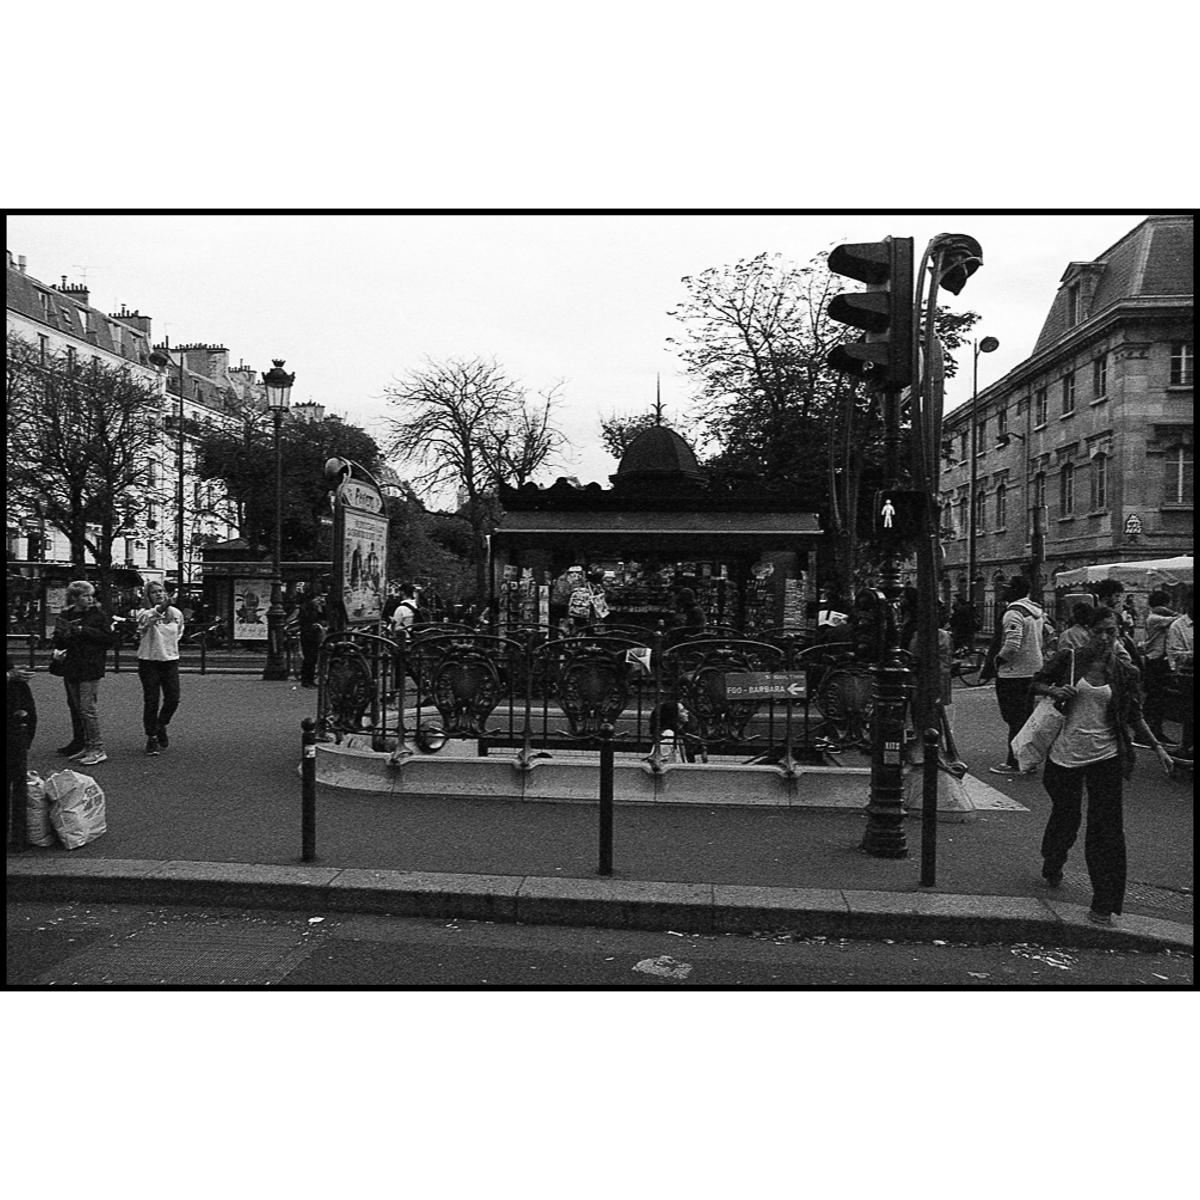 paris file-073.jpg